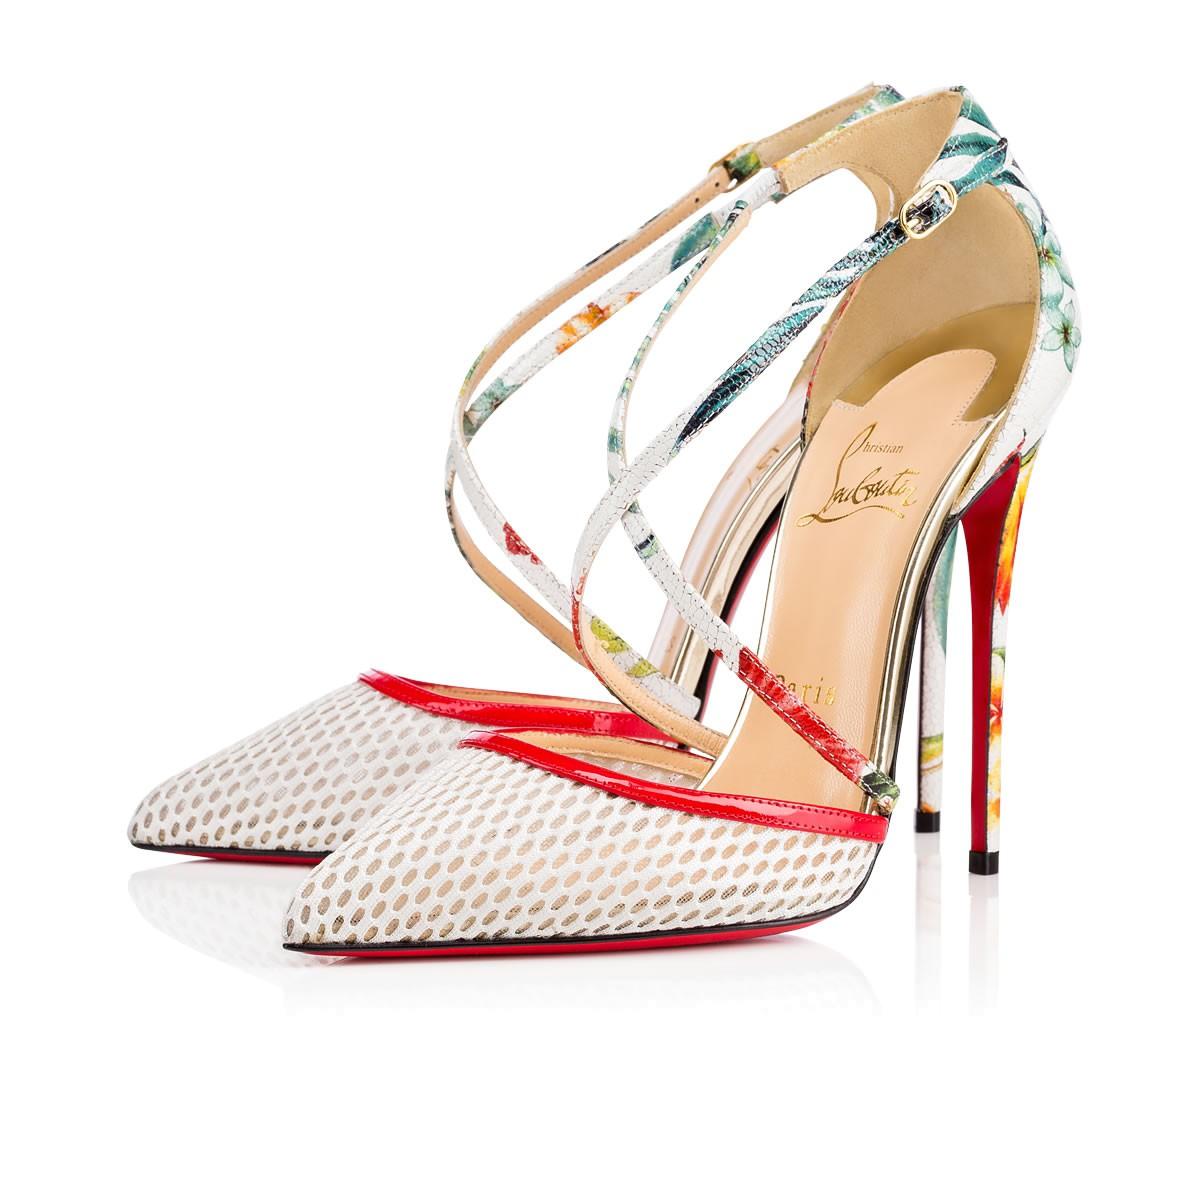 Белые туфли лабутены, модель Cross Blake